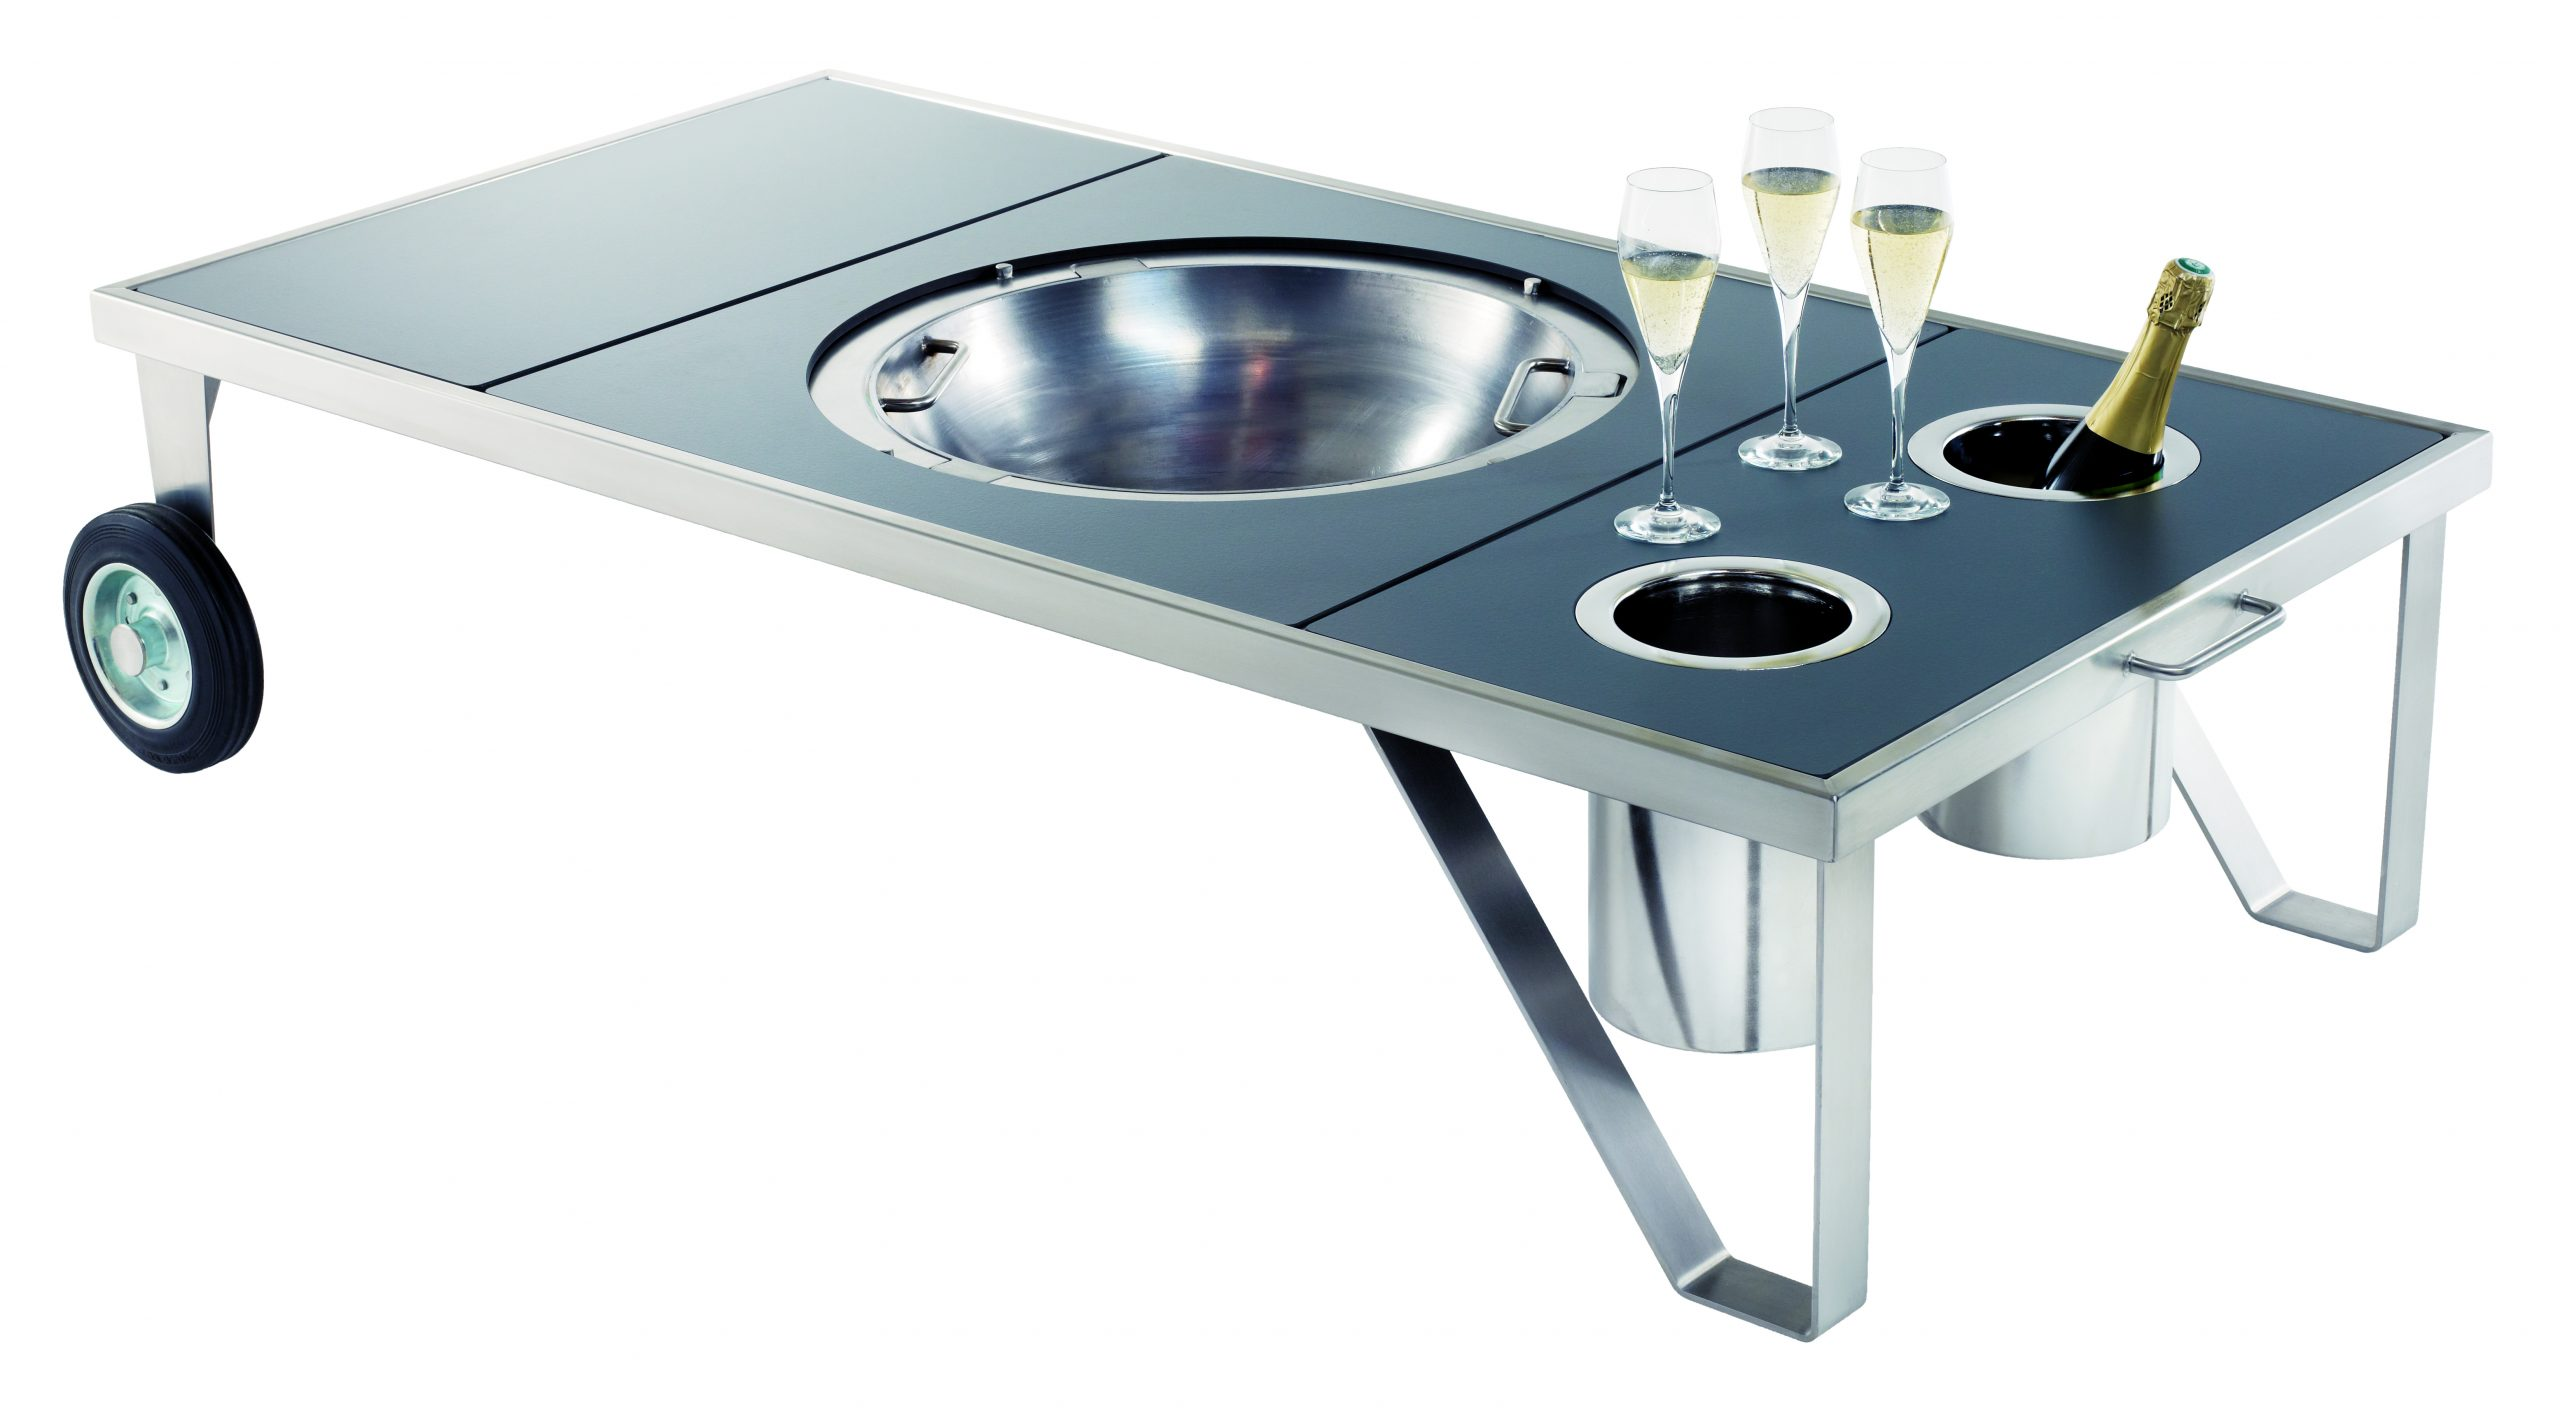 Table basse brasero inox mobile